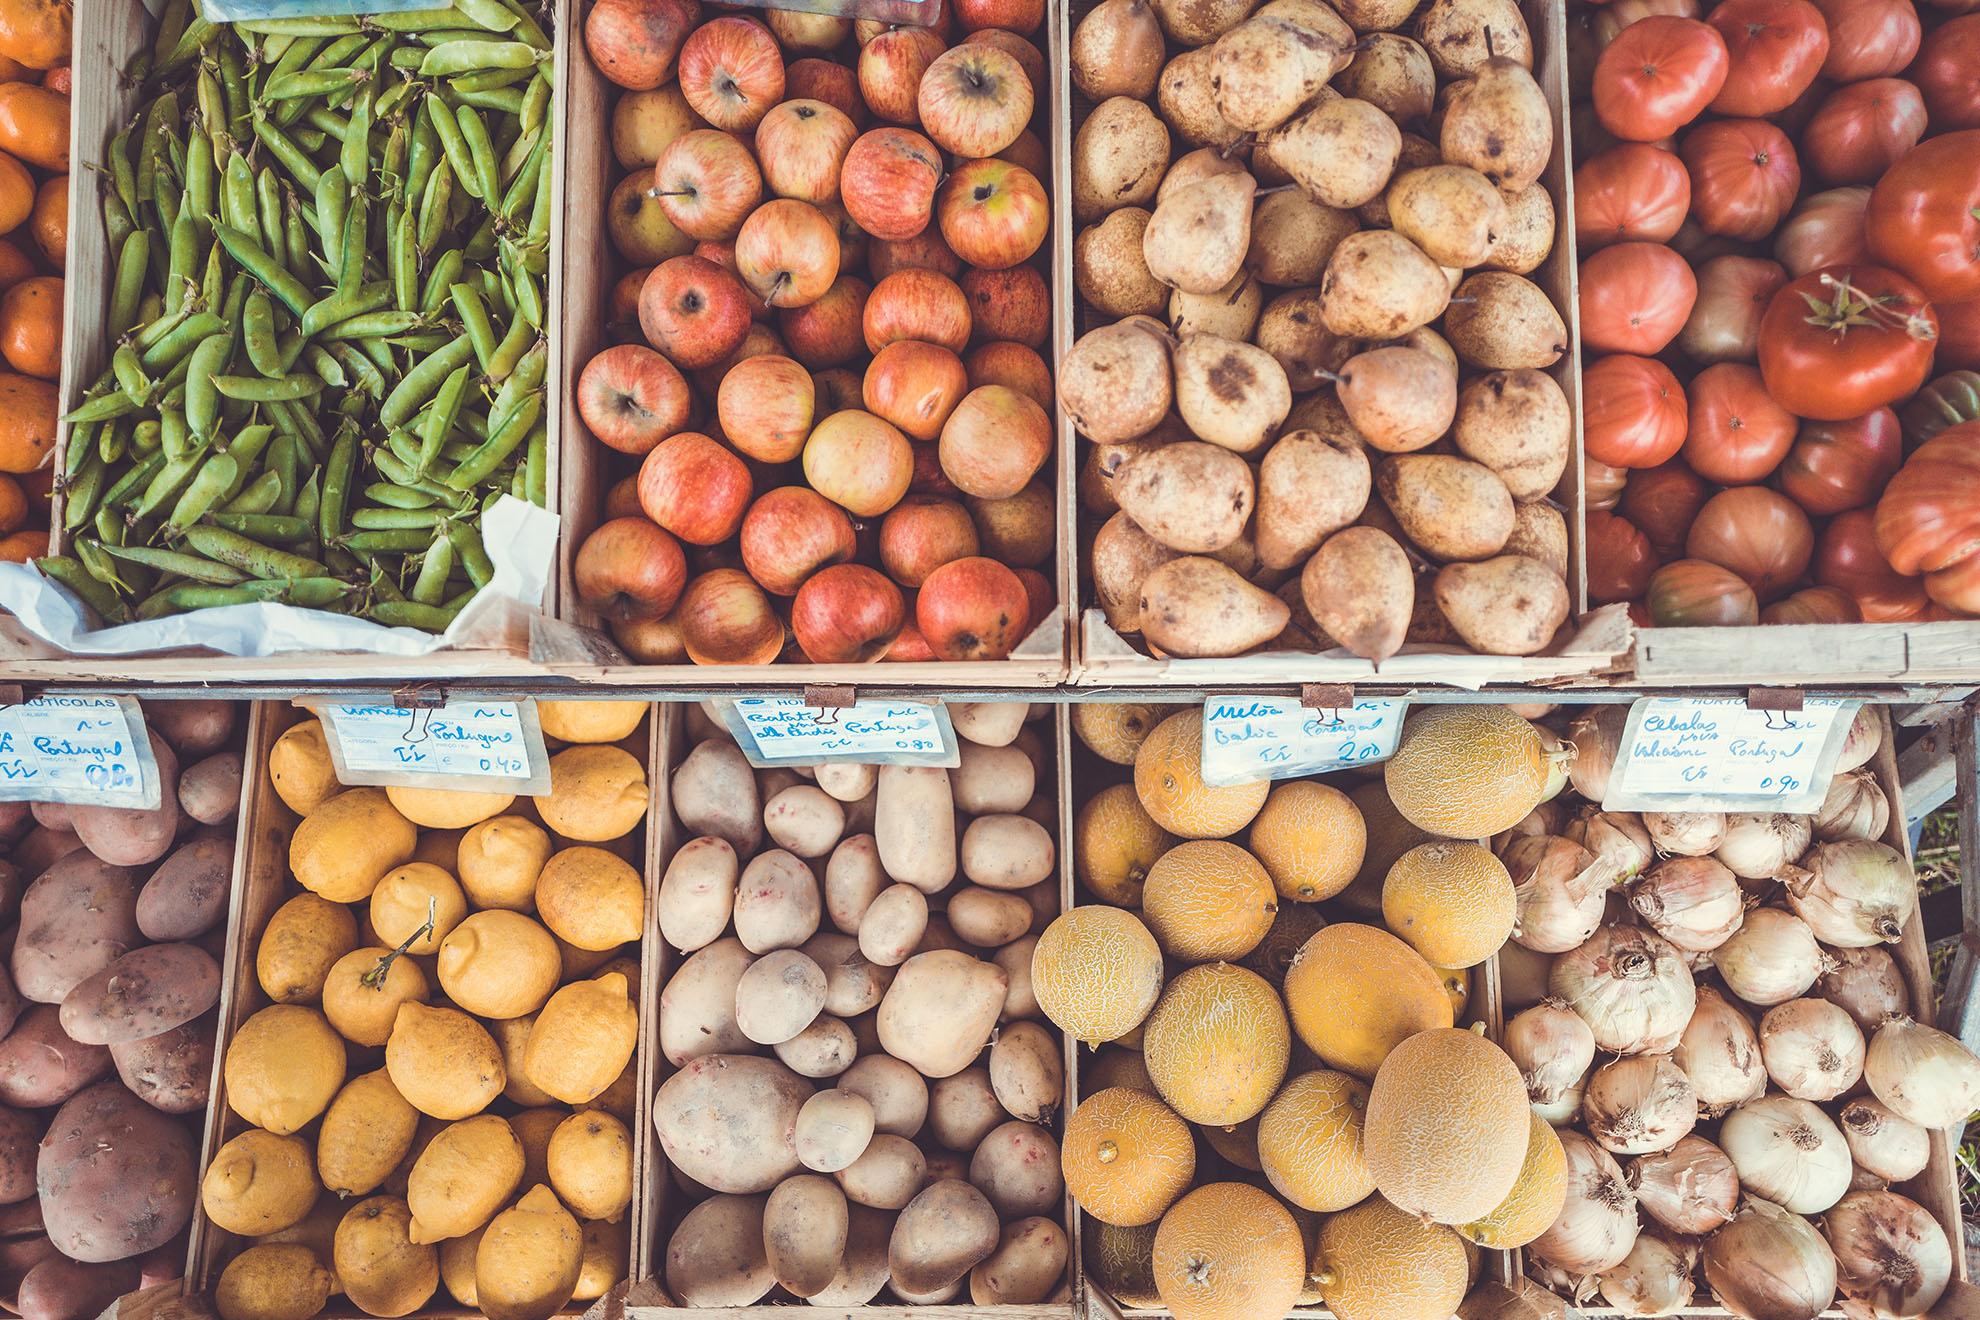 http://foodcoop-winterthur.ch/wp-content/uploads/2017/12/Markt_Kisten.jpg